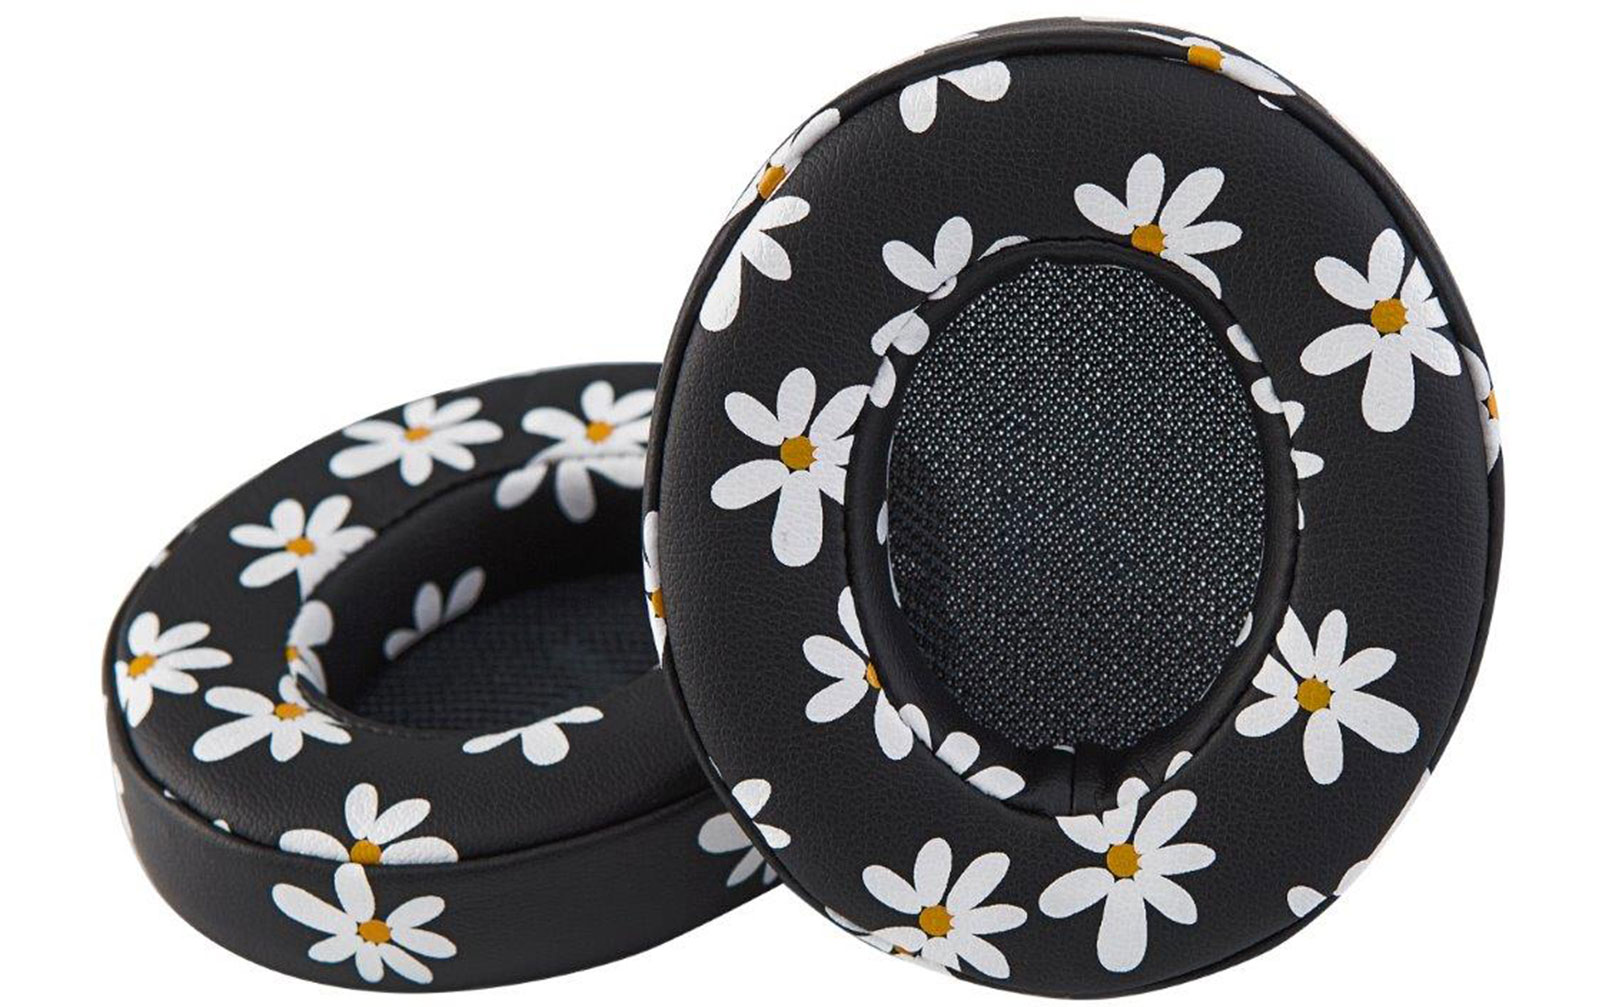 miiego-boom-earpads-1-paar-floral-weiss